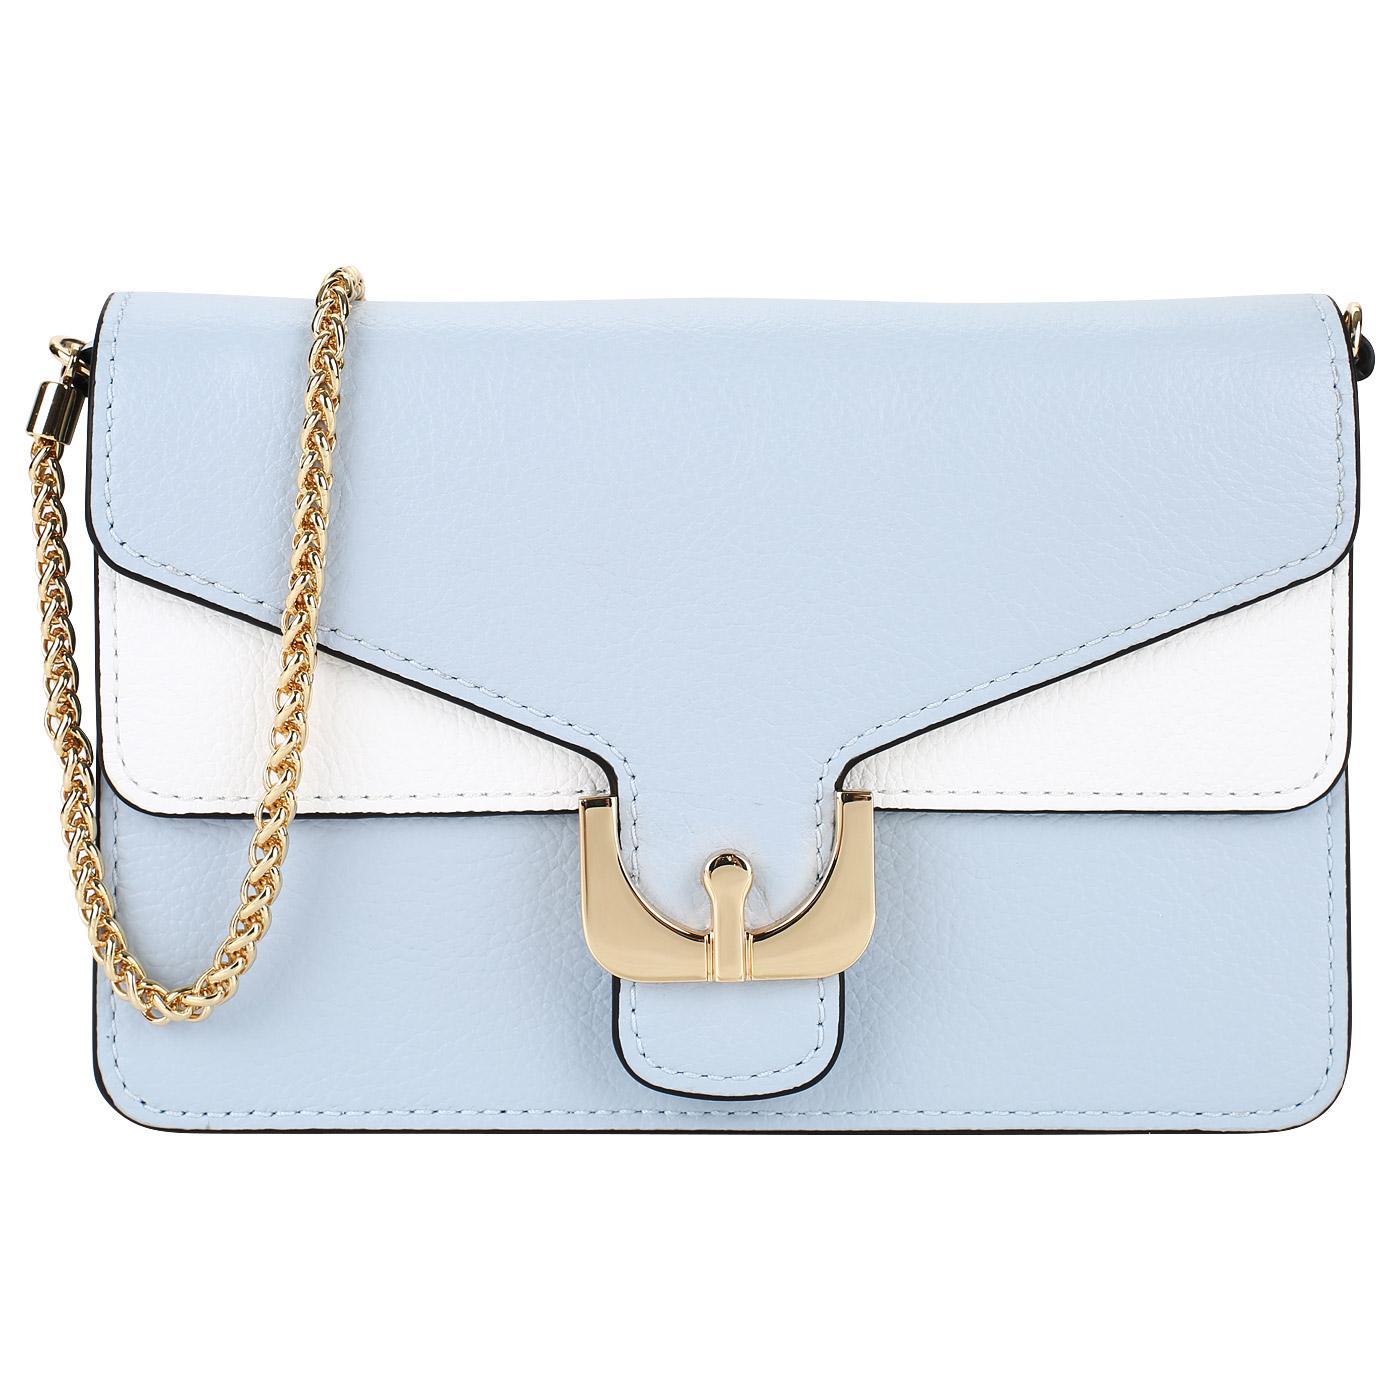 faacc5c4ed52 ... Женская кожаная сумочка со съемной цепочкой Coccinelle Ambrine soft ...